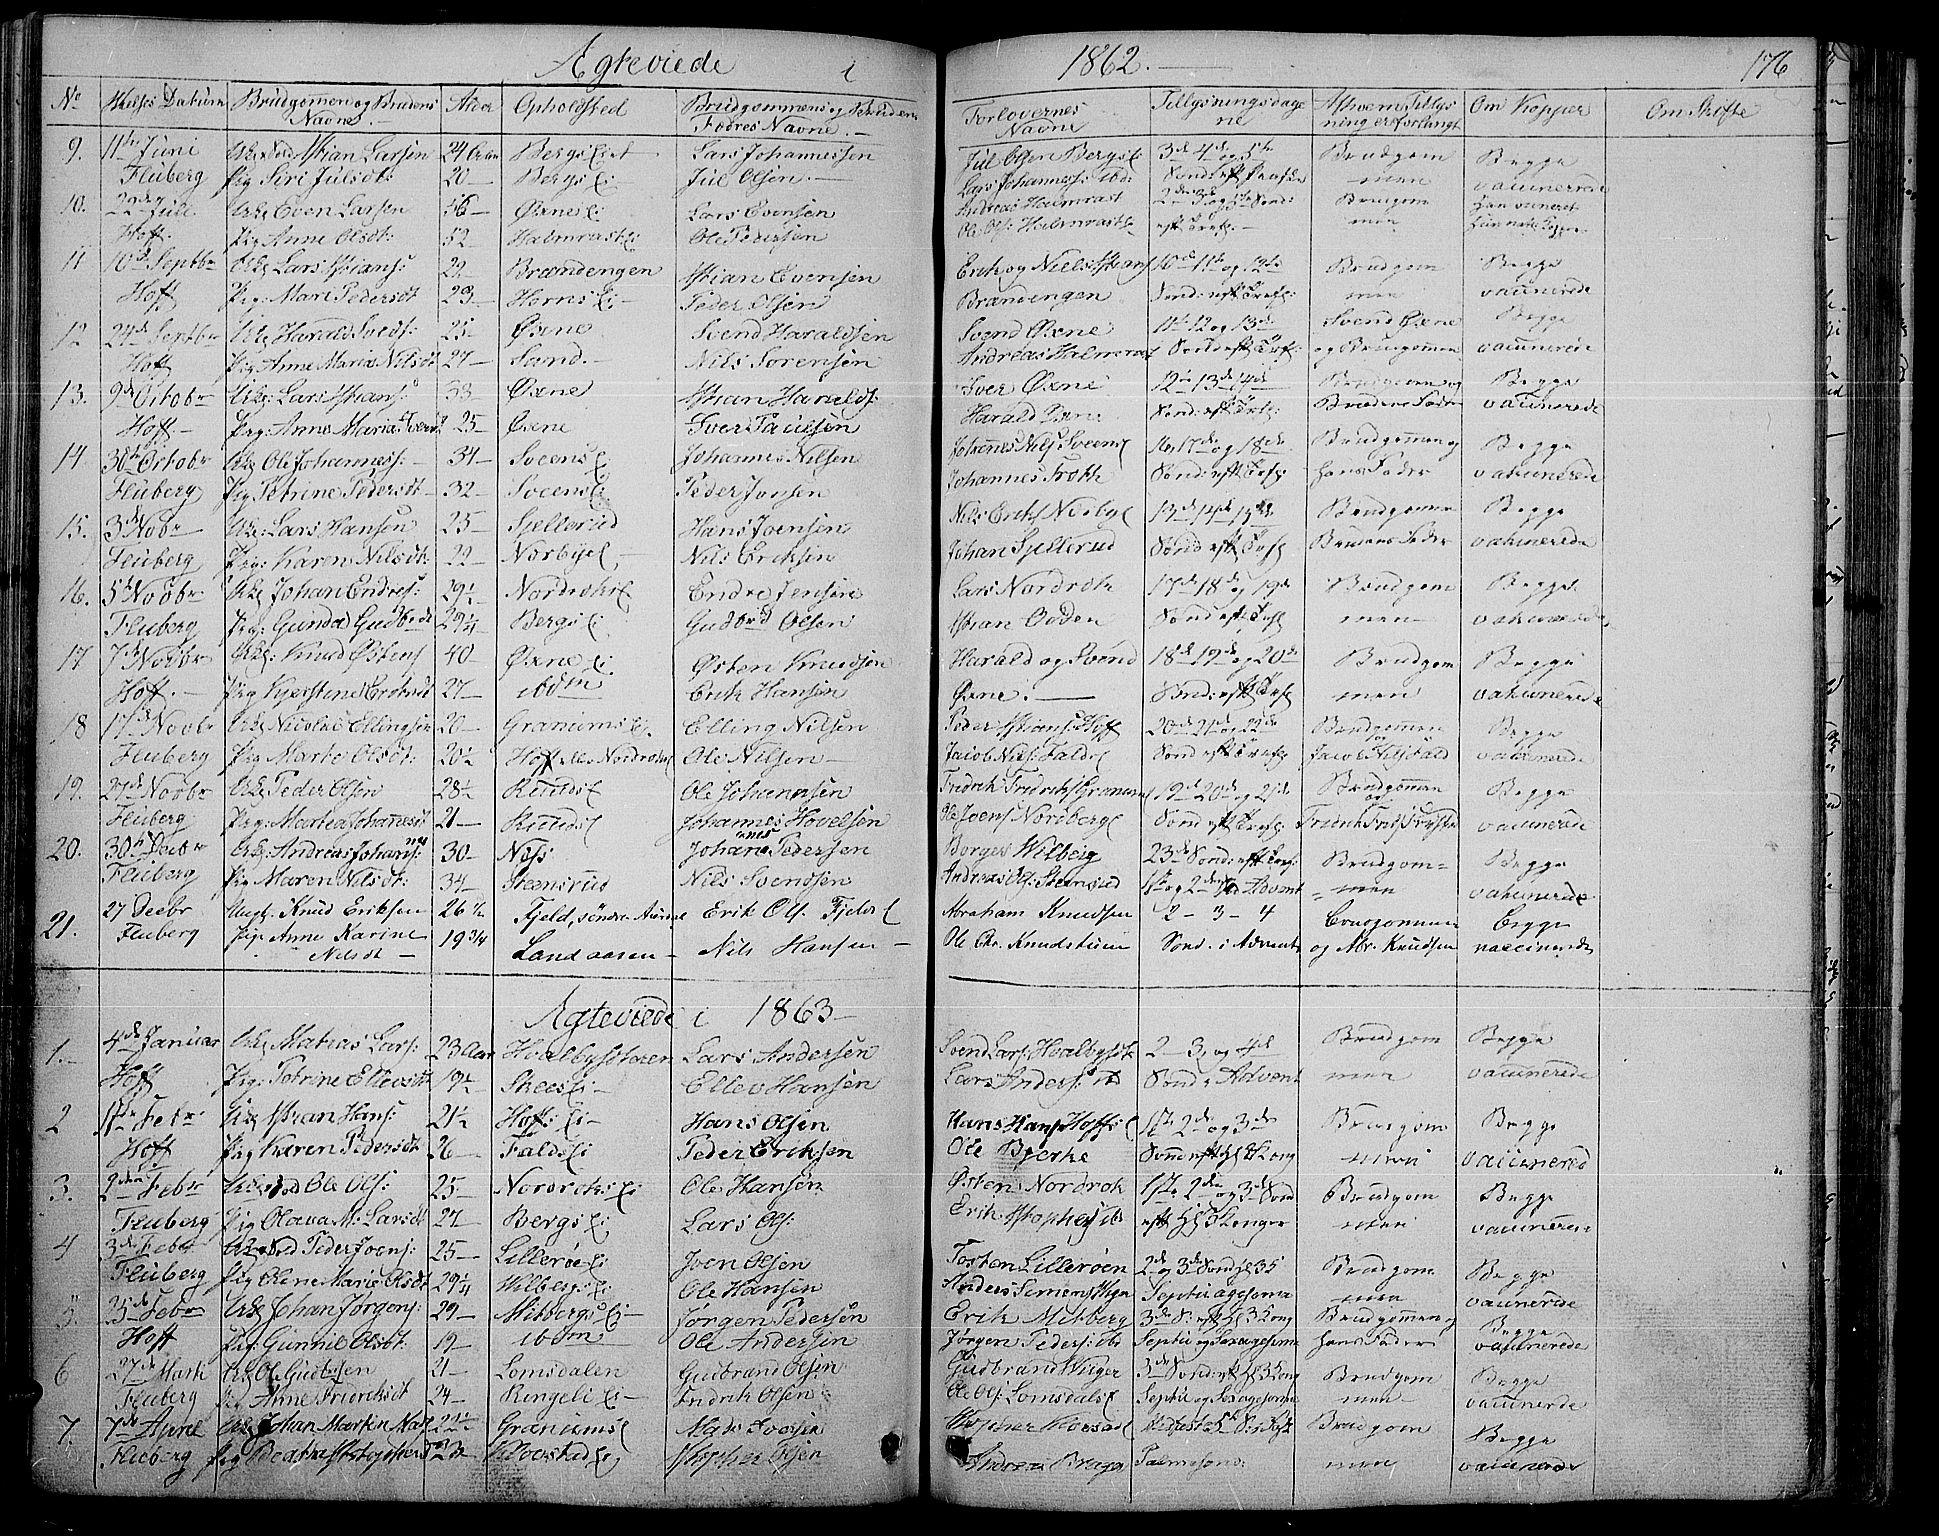 SAH, Søndre Land prestekontor, L/L0001: Klokkerbok nr. 1, 1849-1883, s. 176